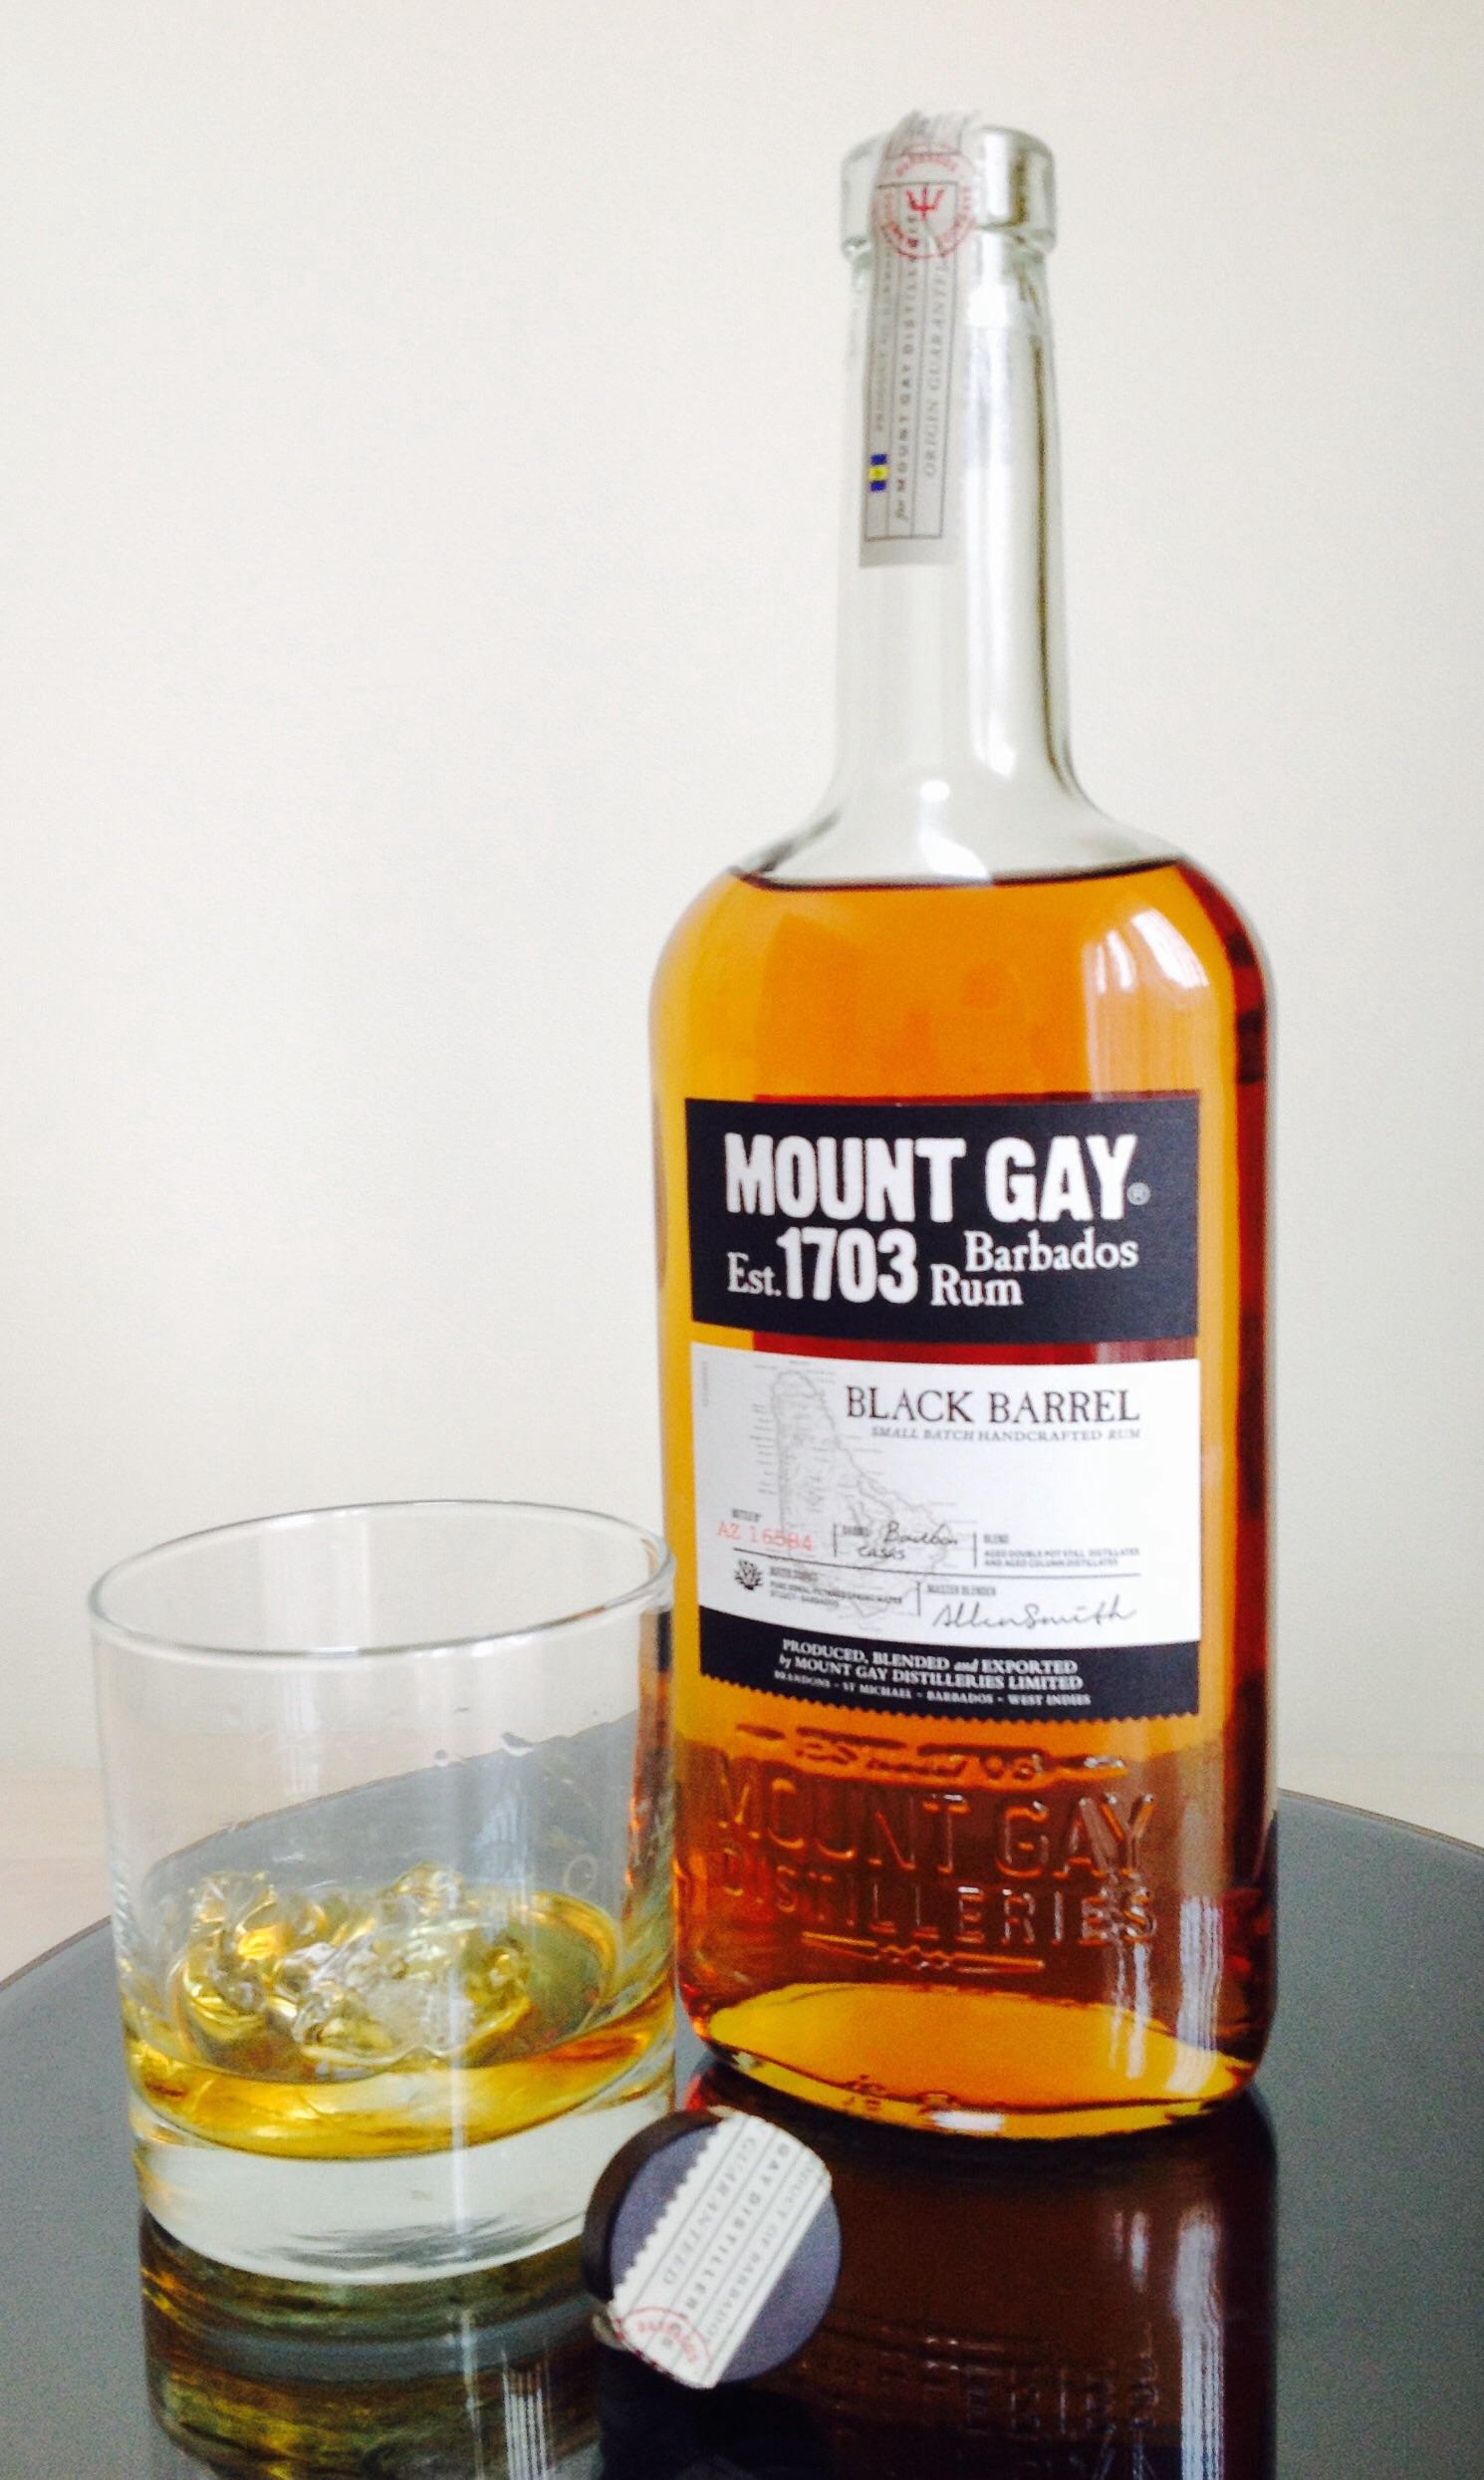 Mount gay rum black barrel review